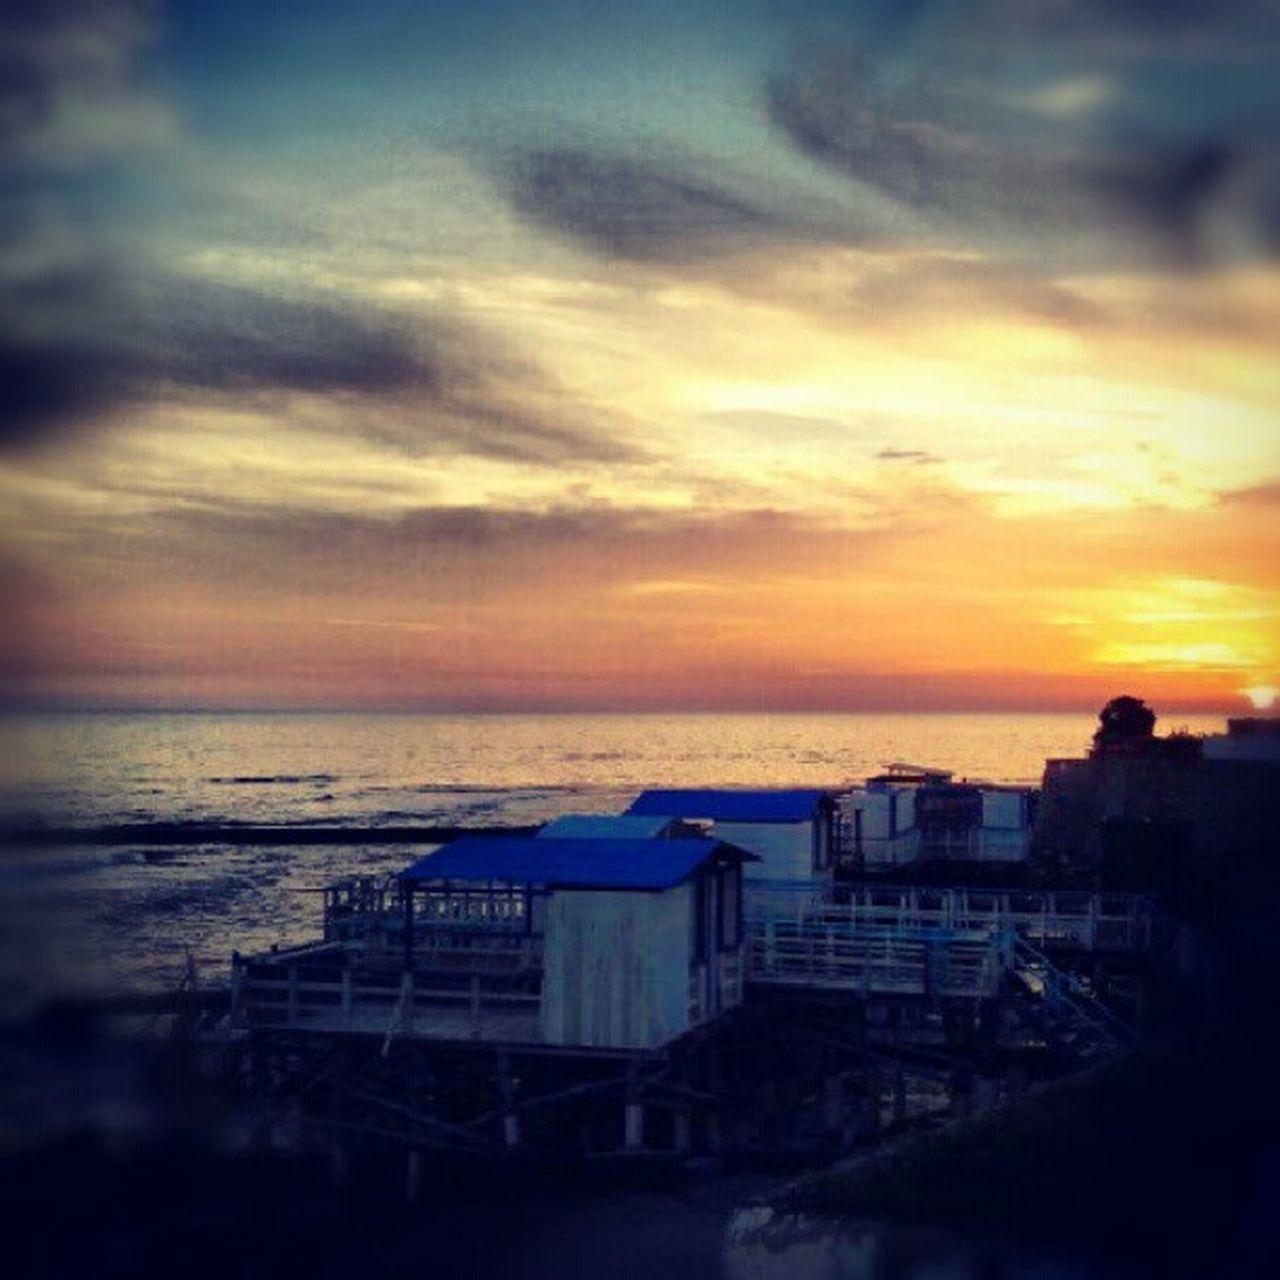 Tramonto Mare Capolinaro SantaMarinella Sunshine Shining Palafitte Sea Sun Loveandsun